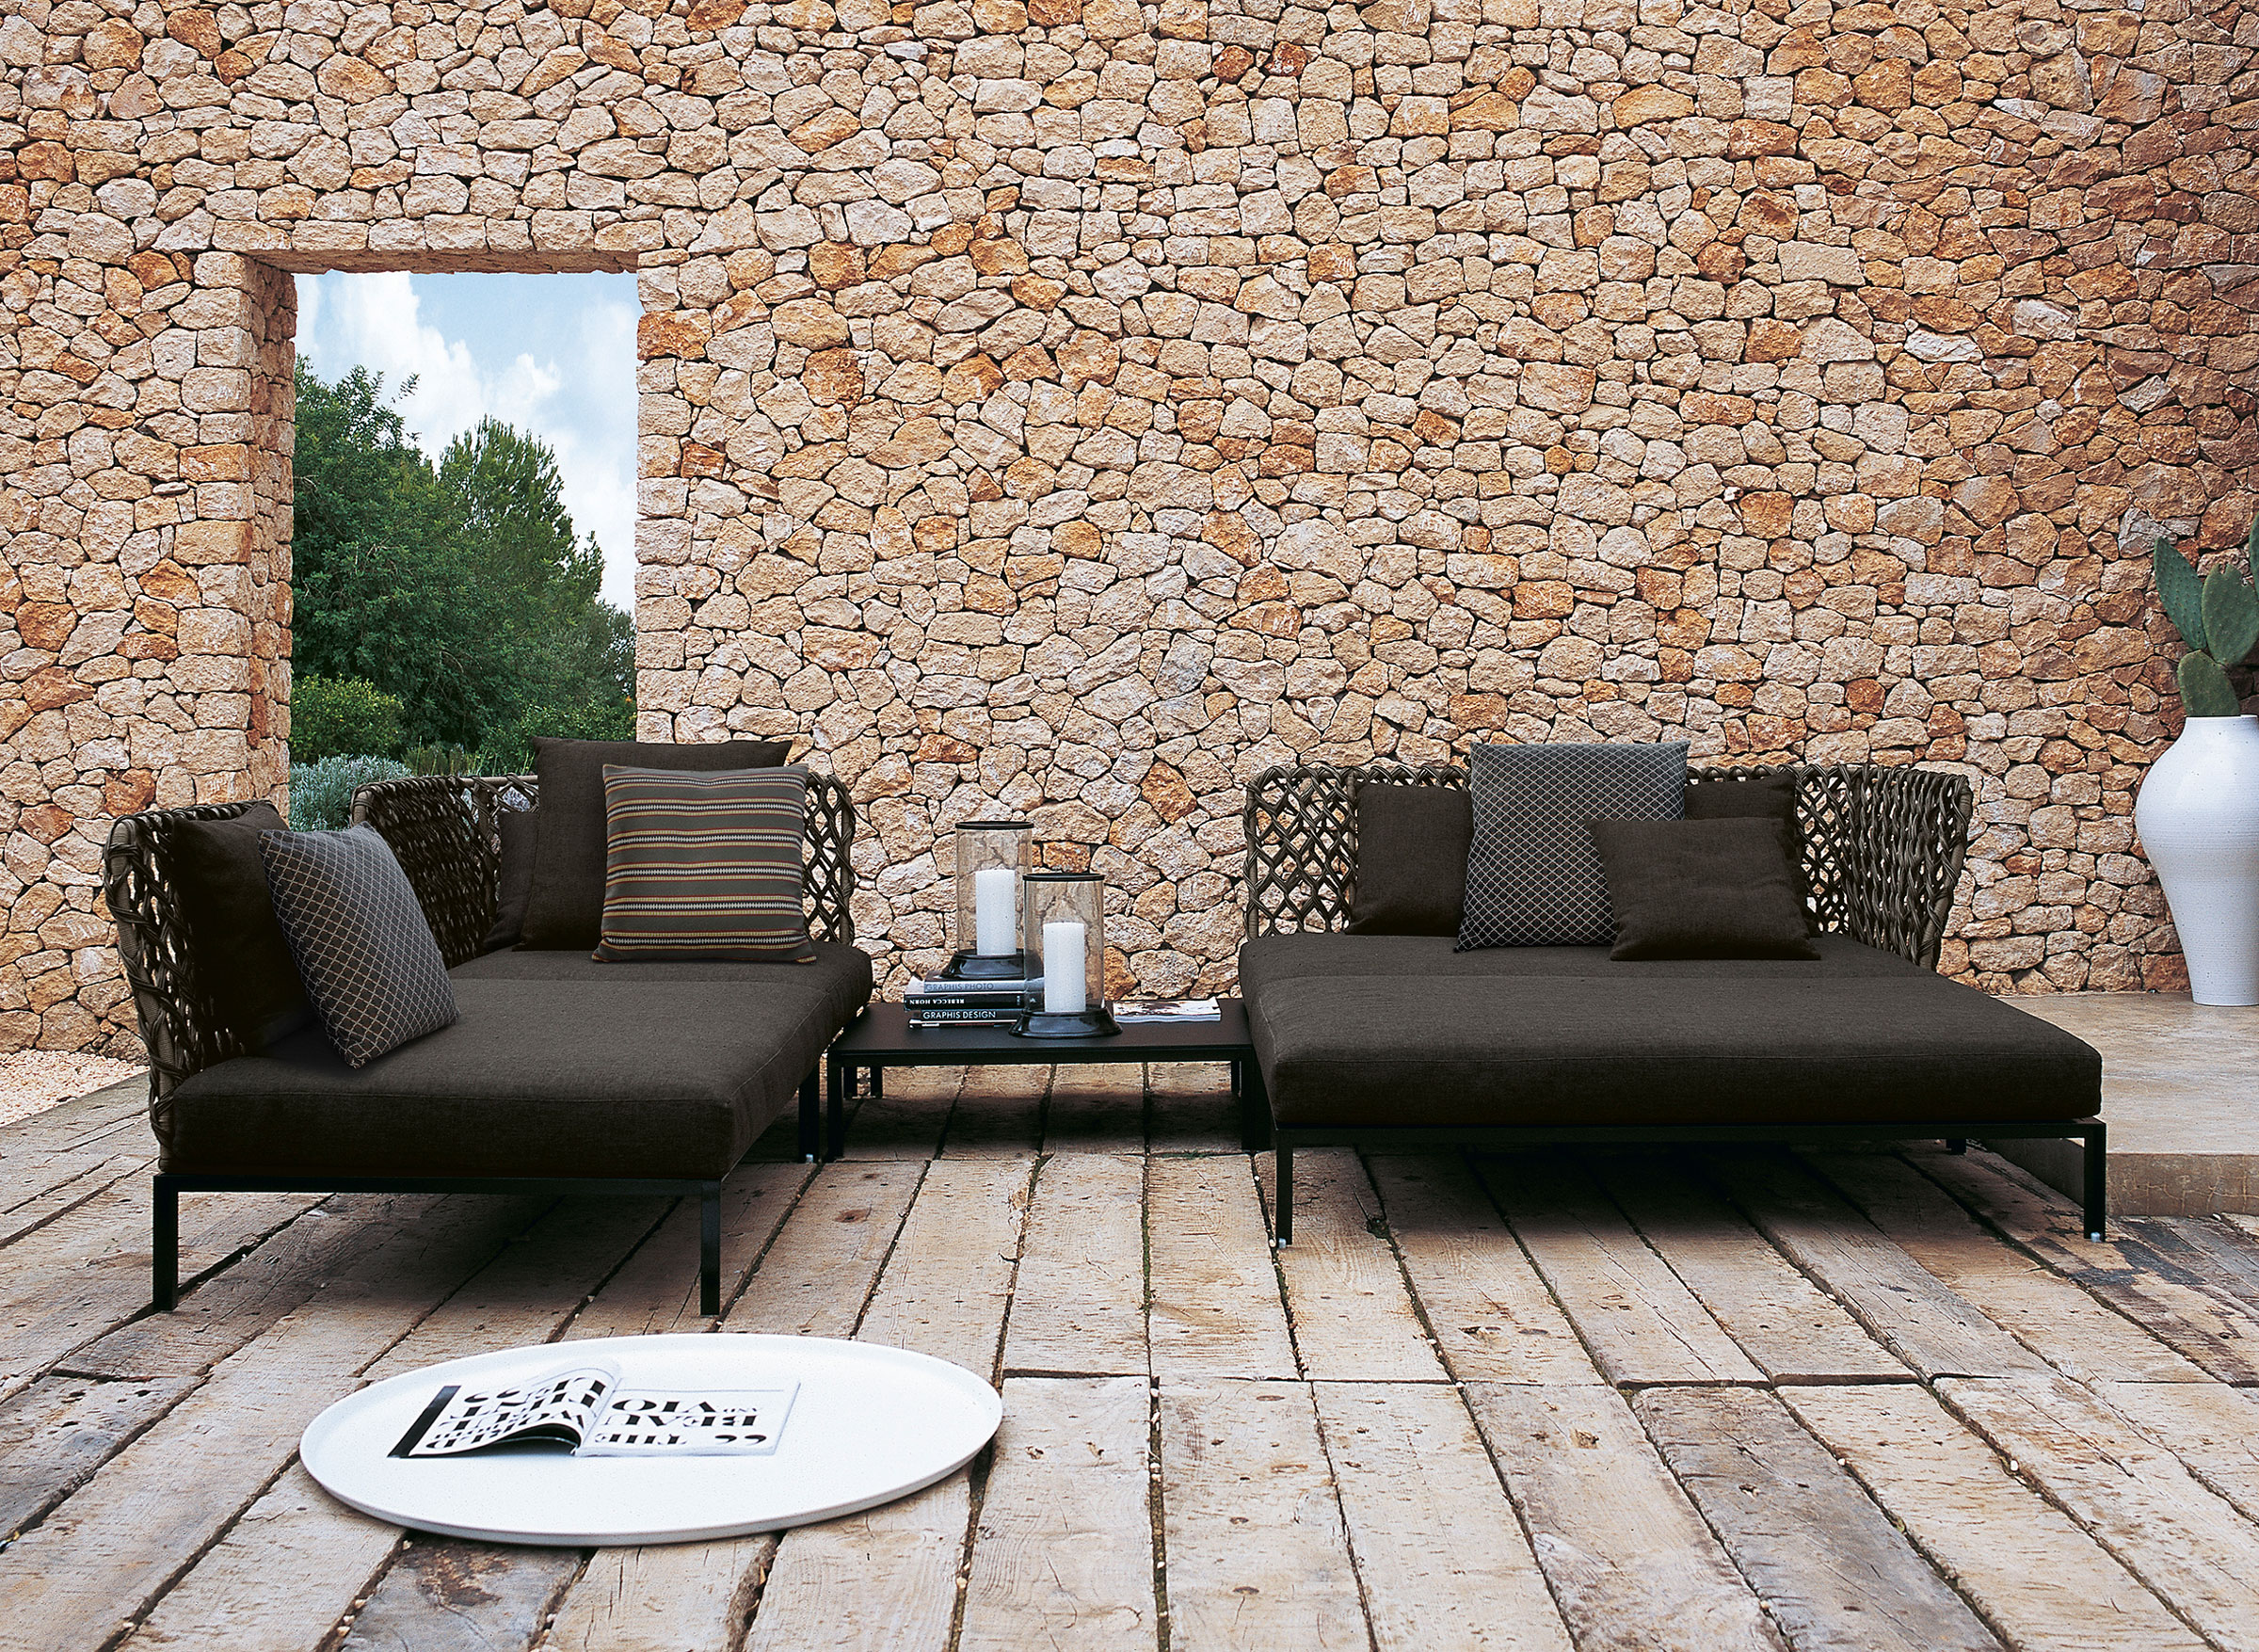 hauser-design-b&b-italia-loung-ravel-in-dunkel